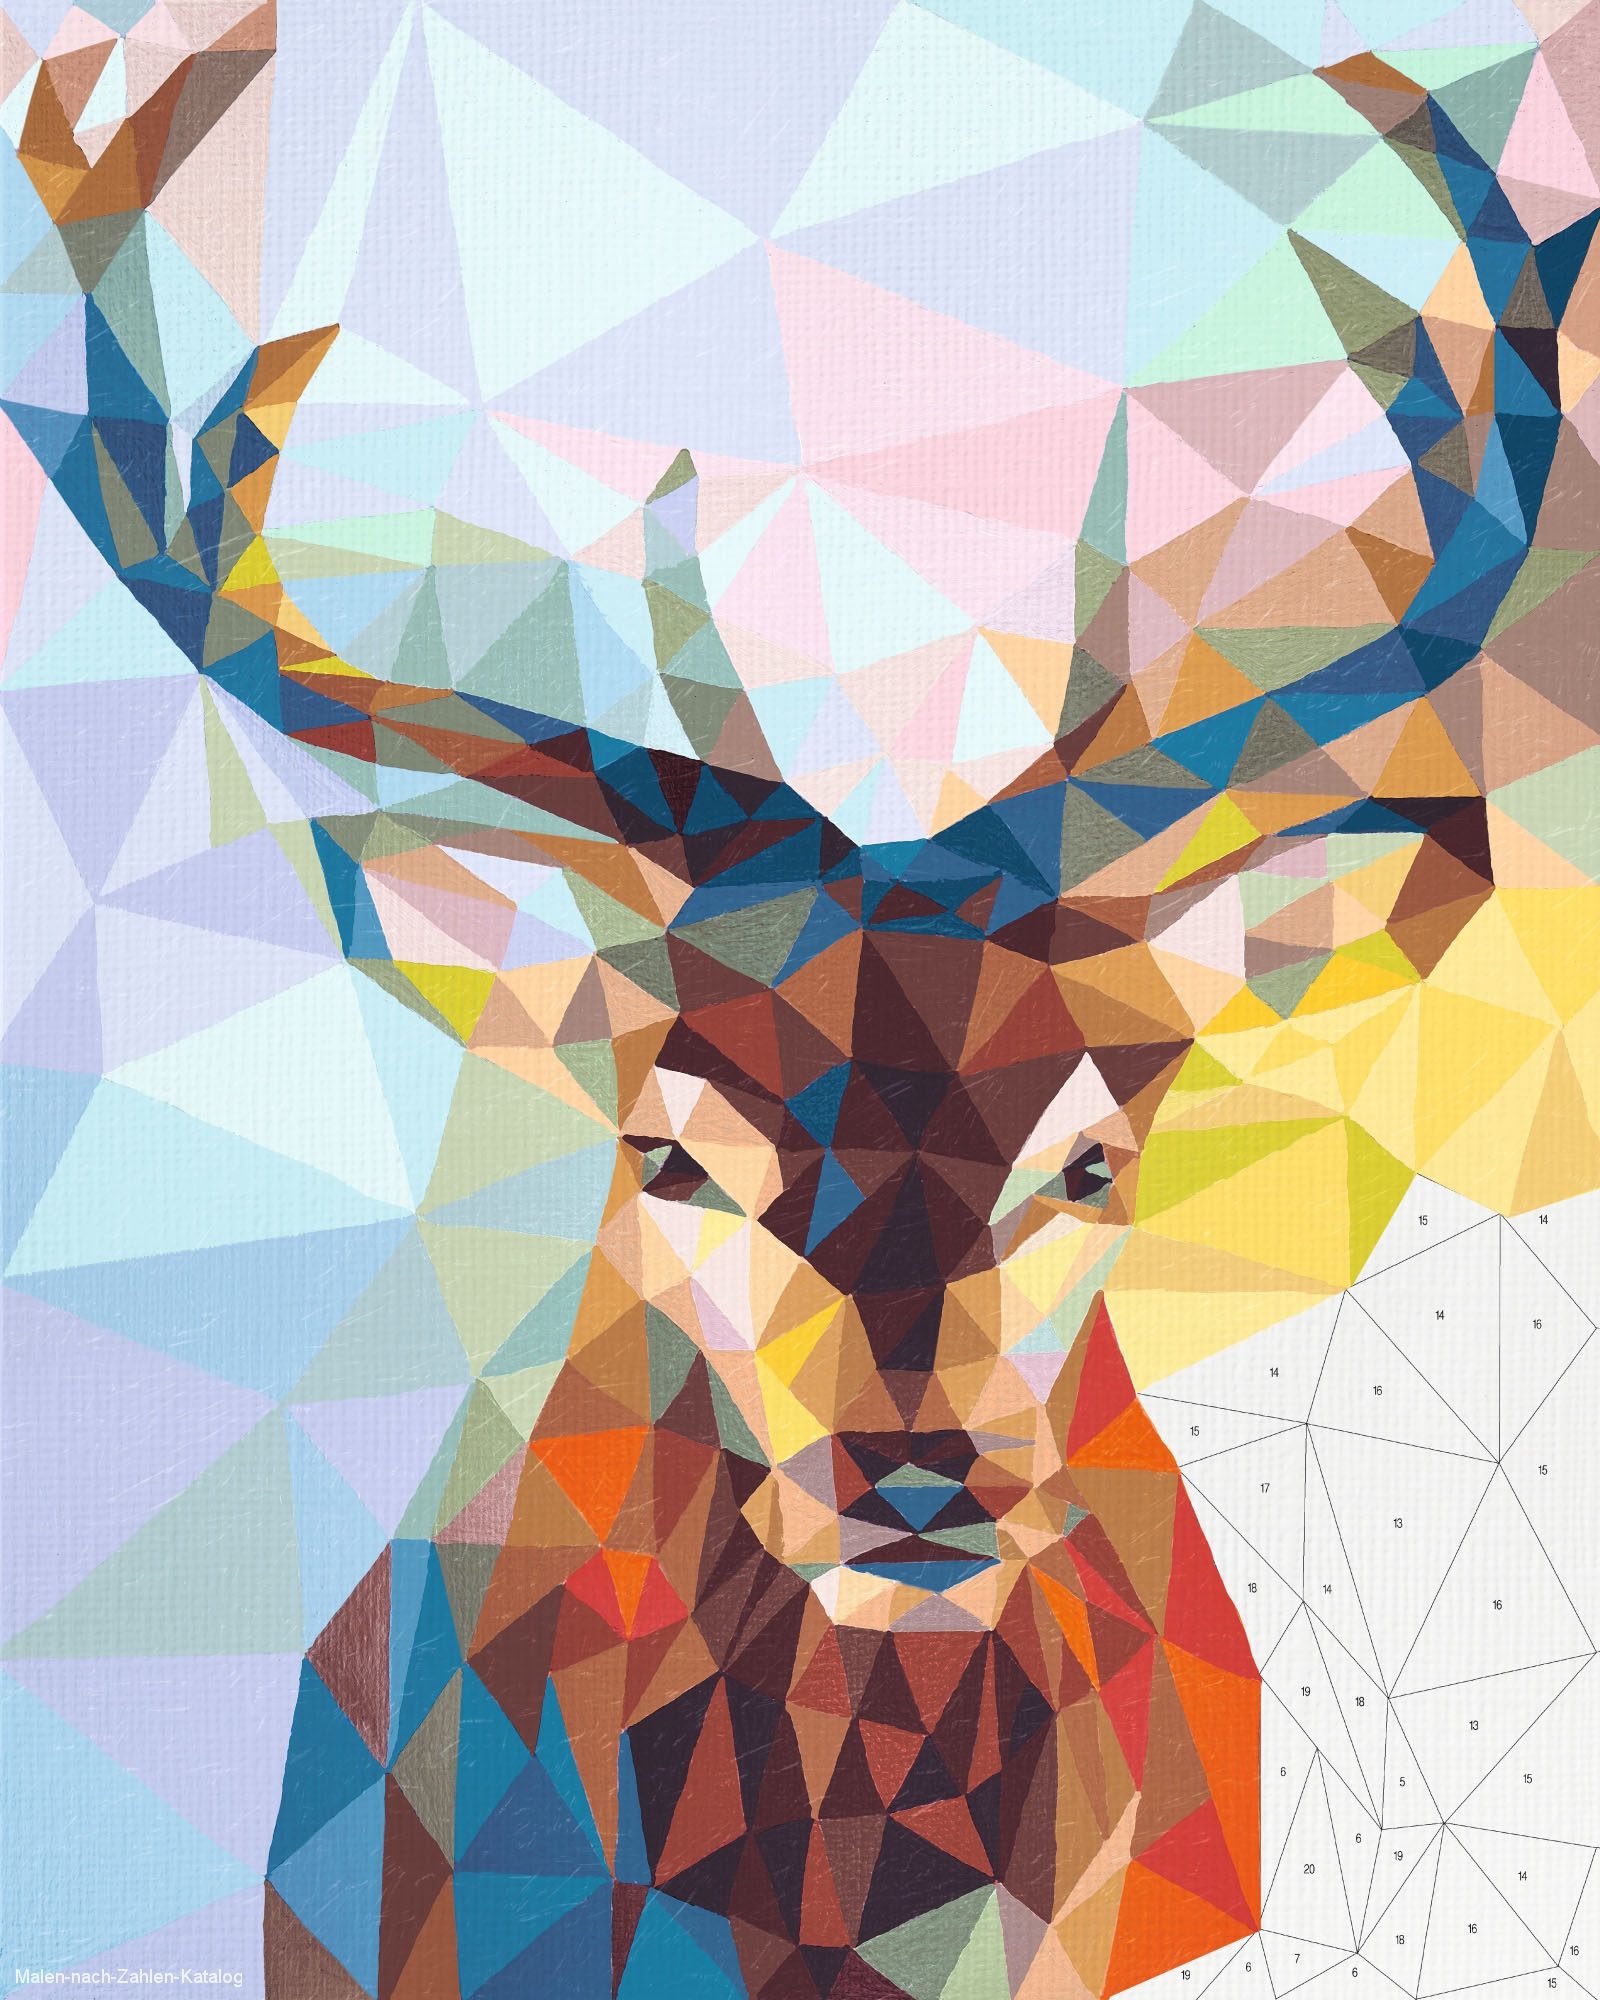 Schipper Malen nach Zahlen 40x50cm Hirsch Polygon-Art